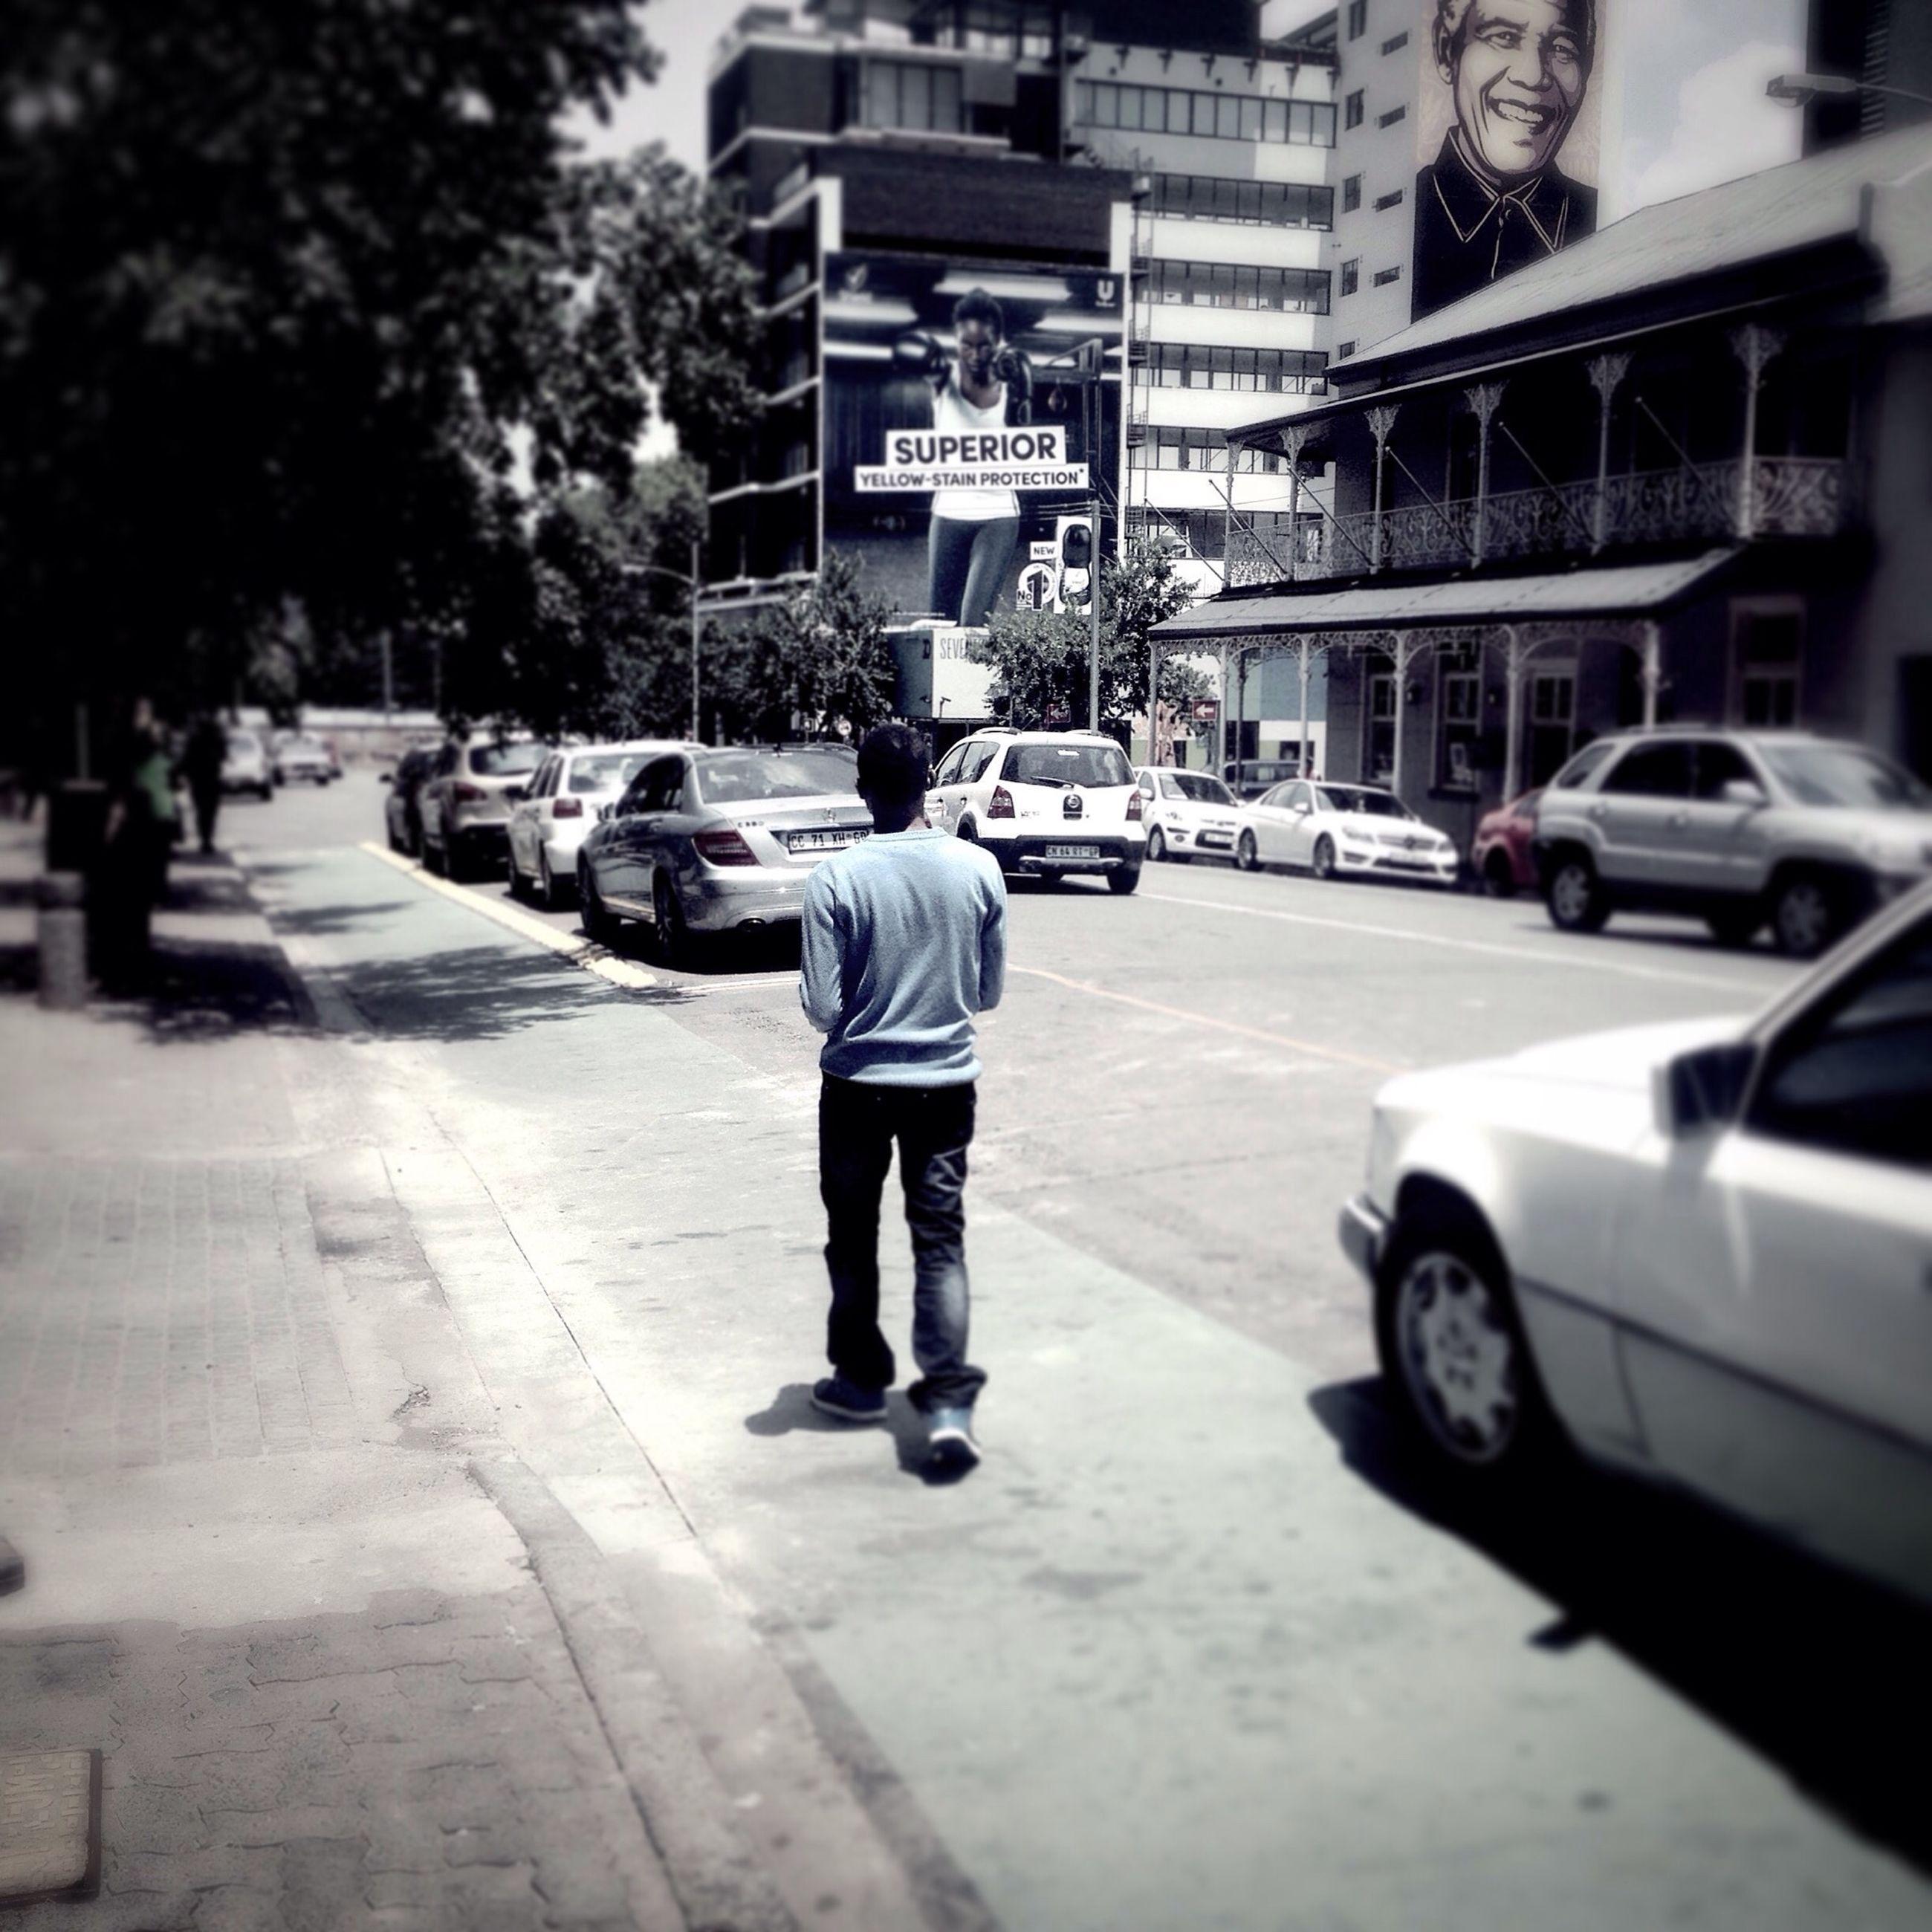 street, car, transportation, walking, rear view, building exterior, city, road, full length, land vehicle, city life, lifestyles, mode of transport, architecture, men, city street, built structure, sidewalk